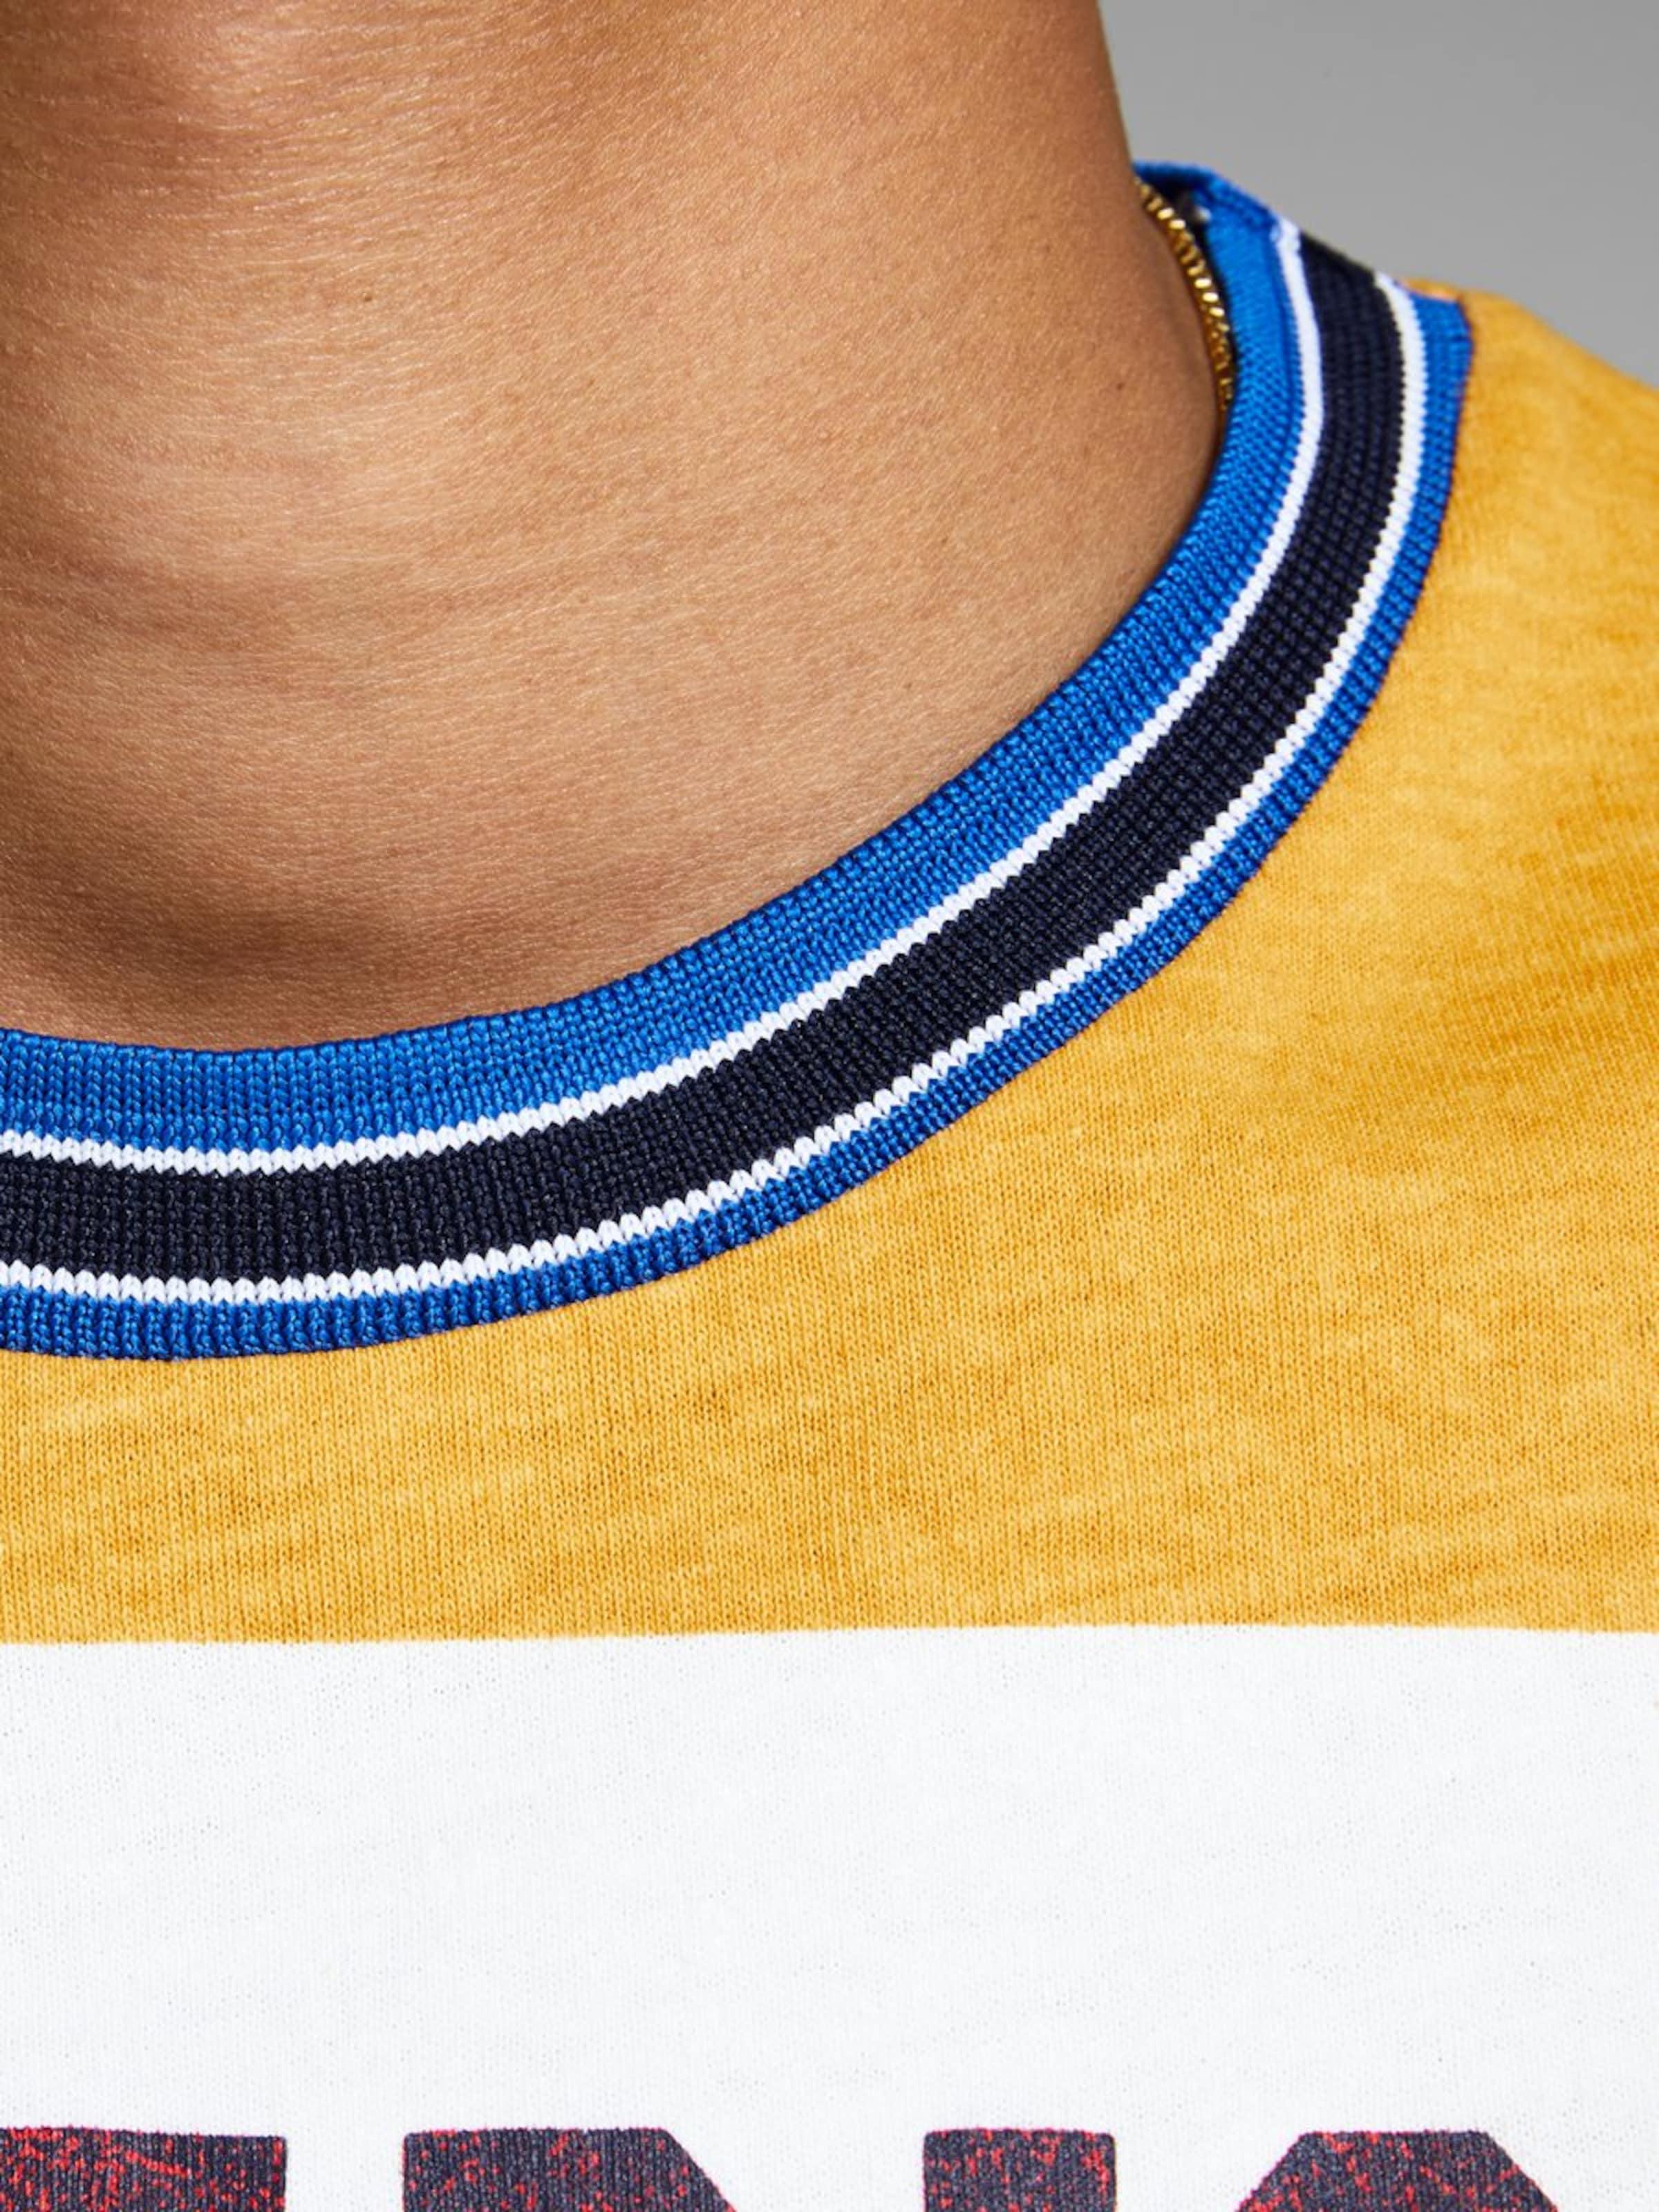 En Jones shirt Blanc BleuMarron Jackamp; T Miel Noir wOkZPiuXT